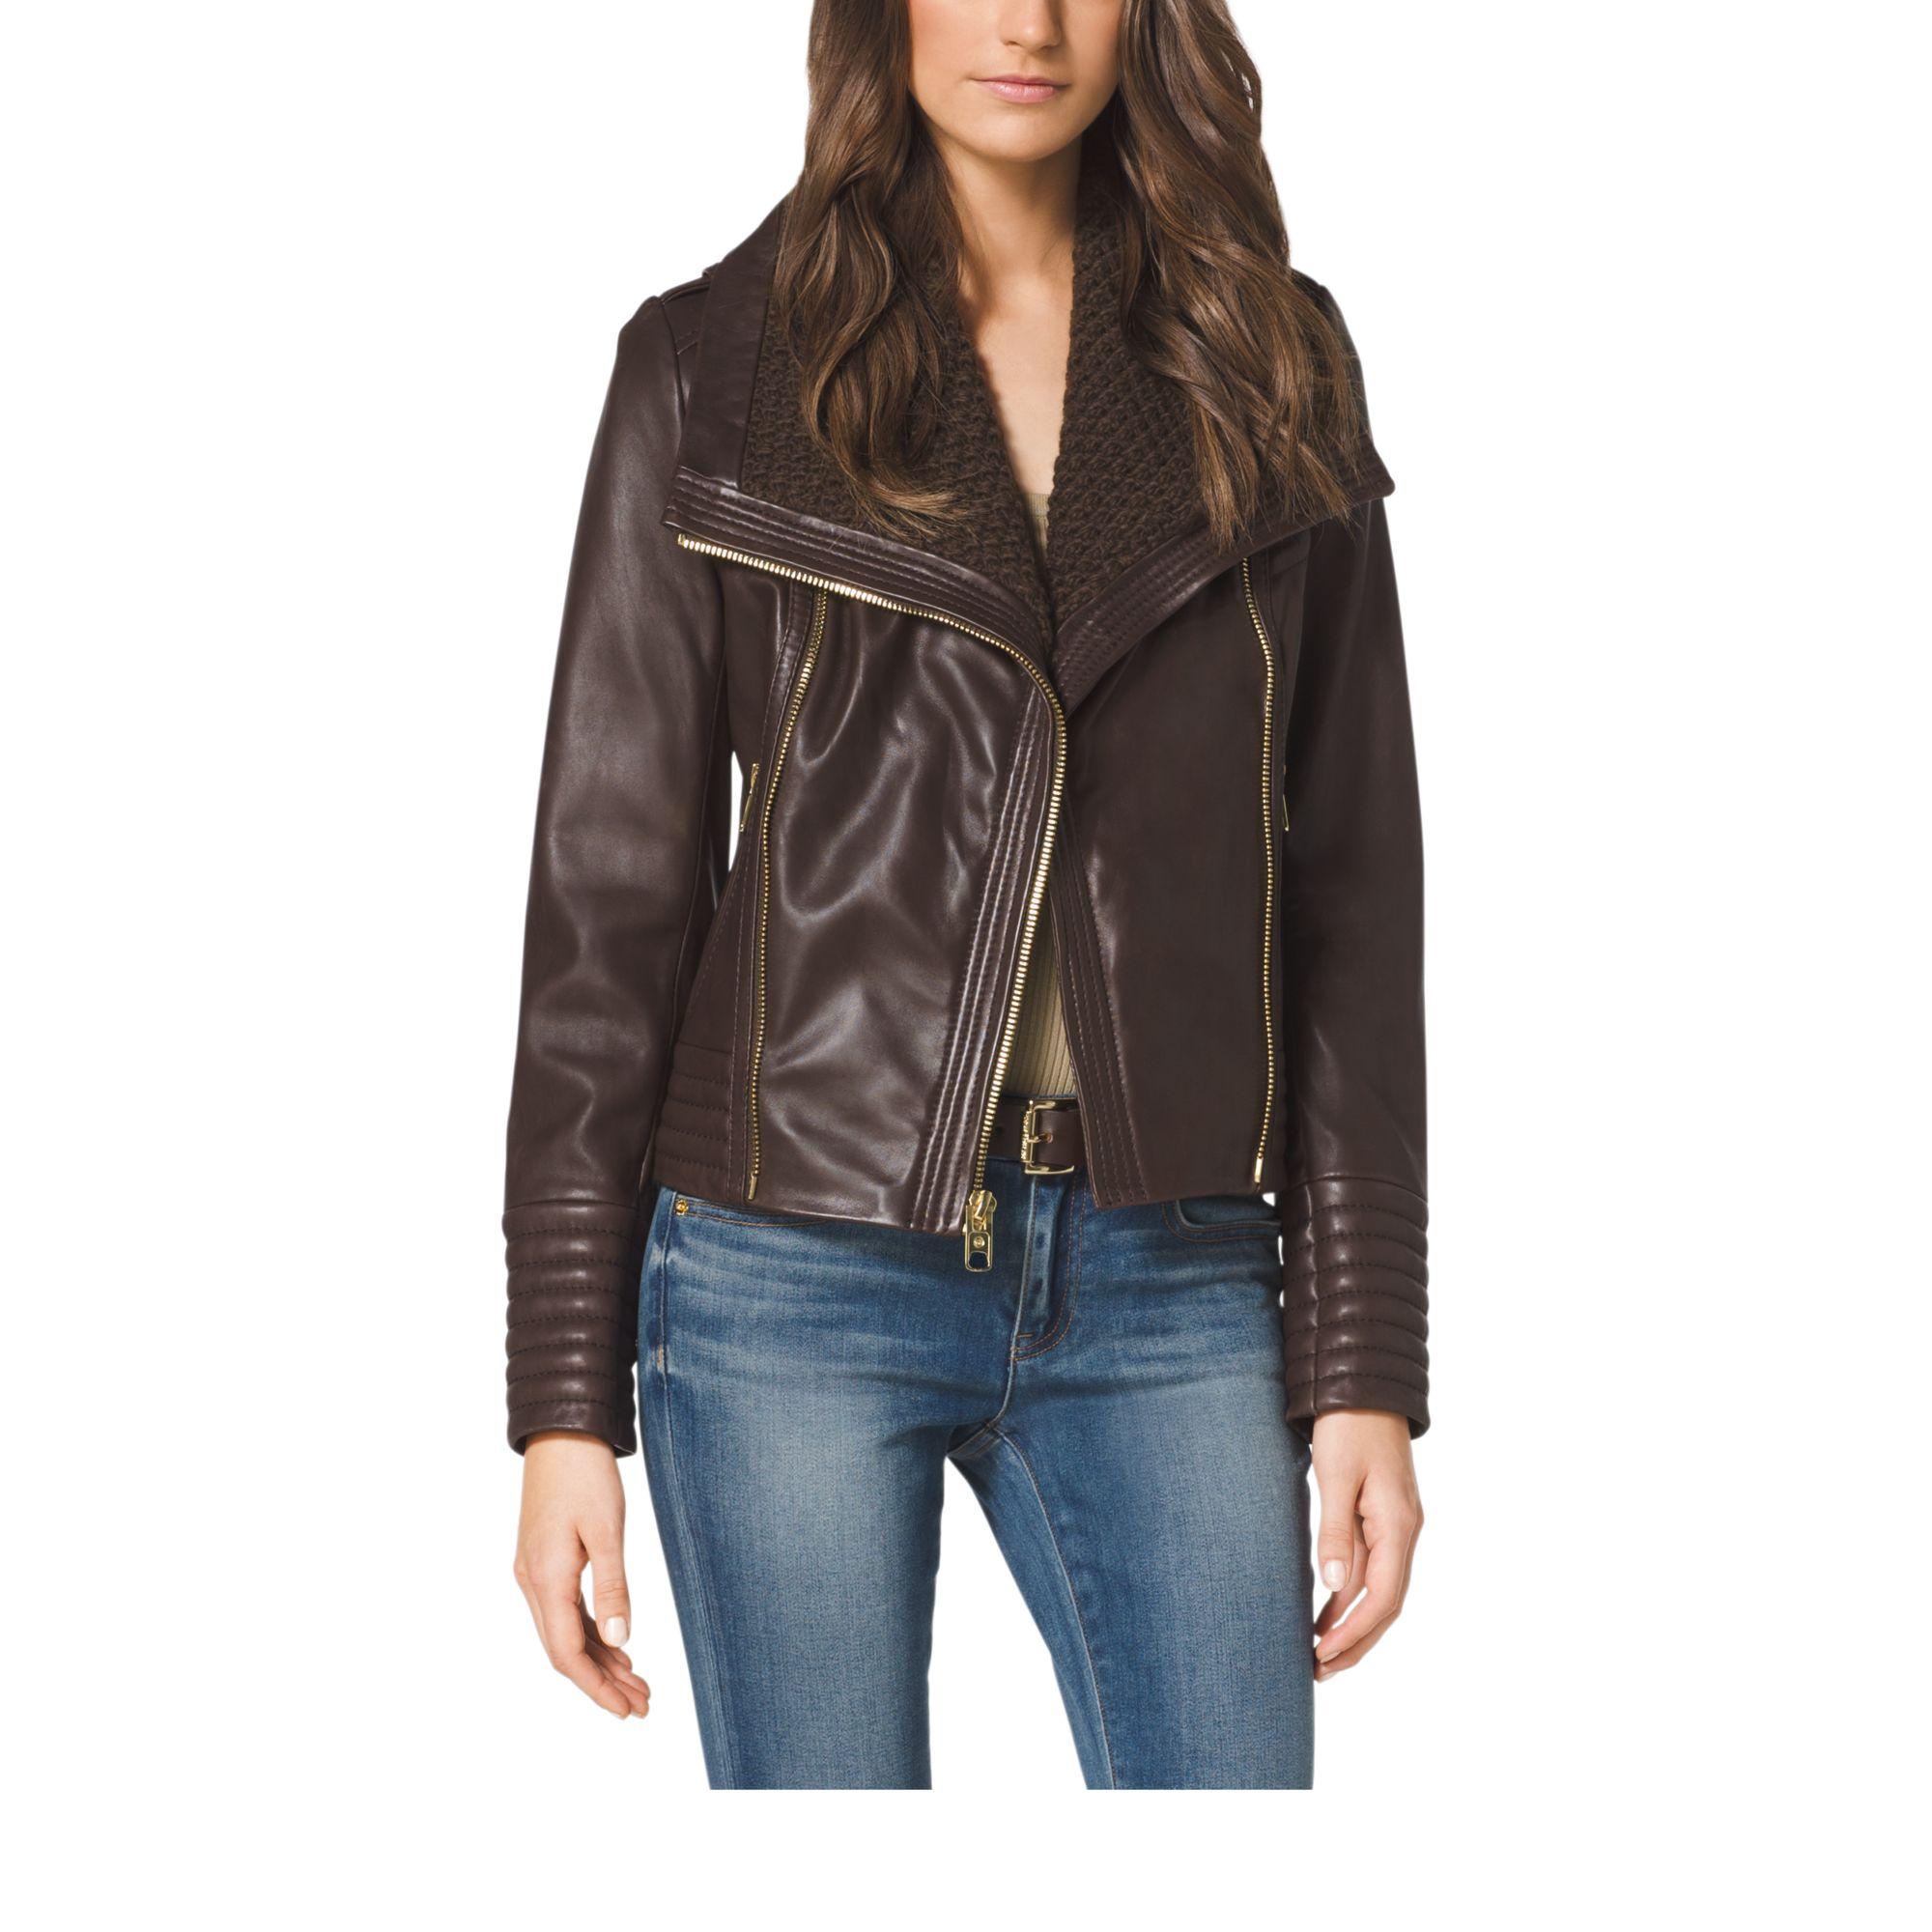 3770bc3ec262 Lyst - Michael Kors Asymmetric-Zip Leather Jacket in Brown